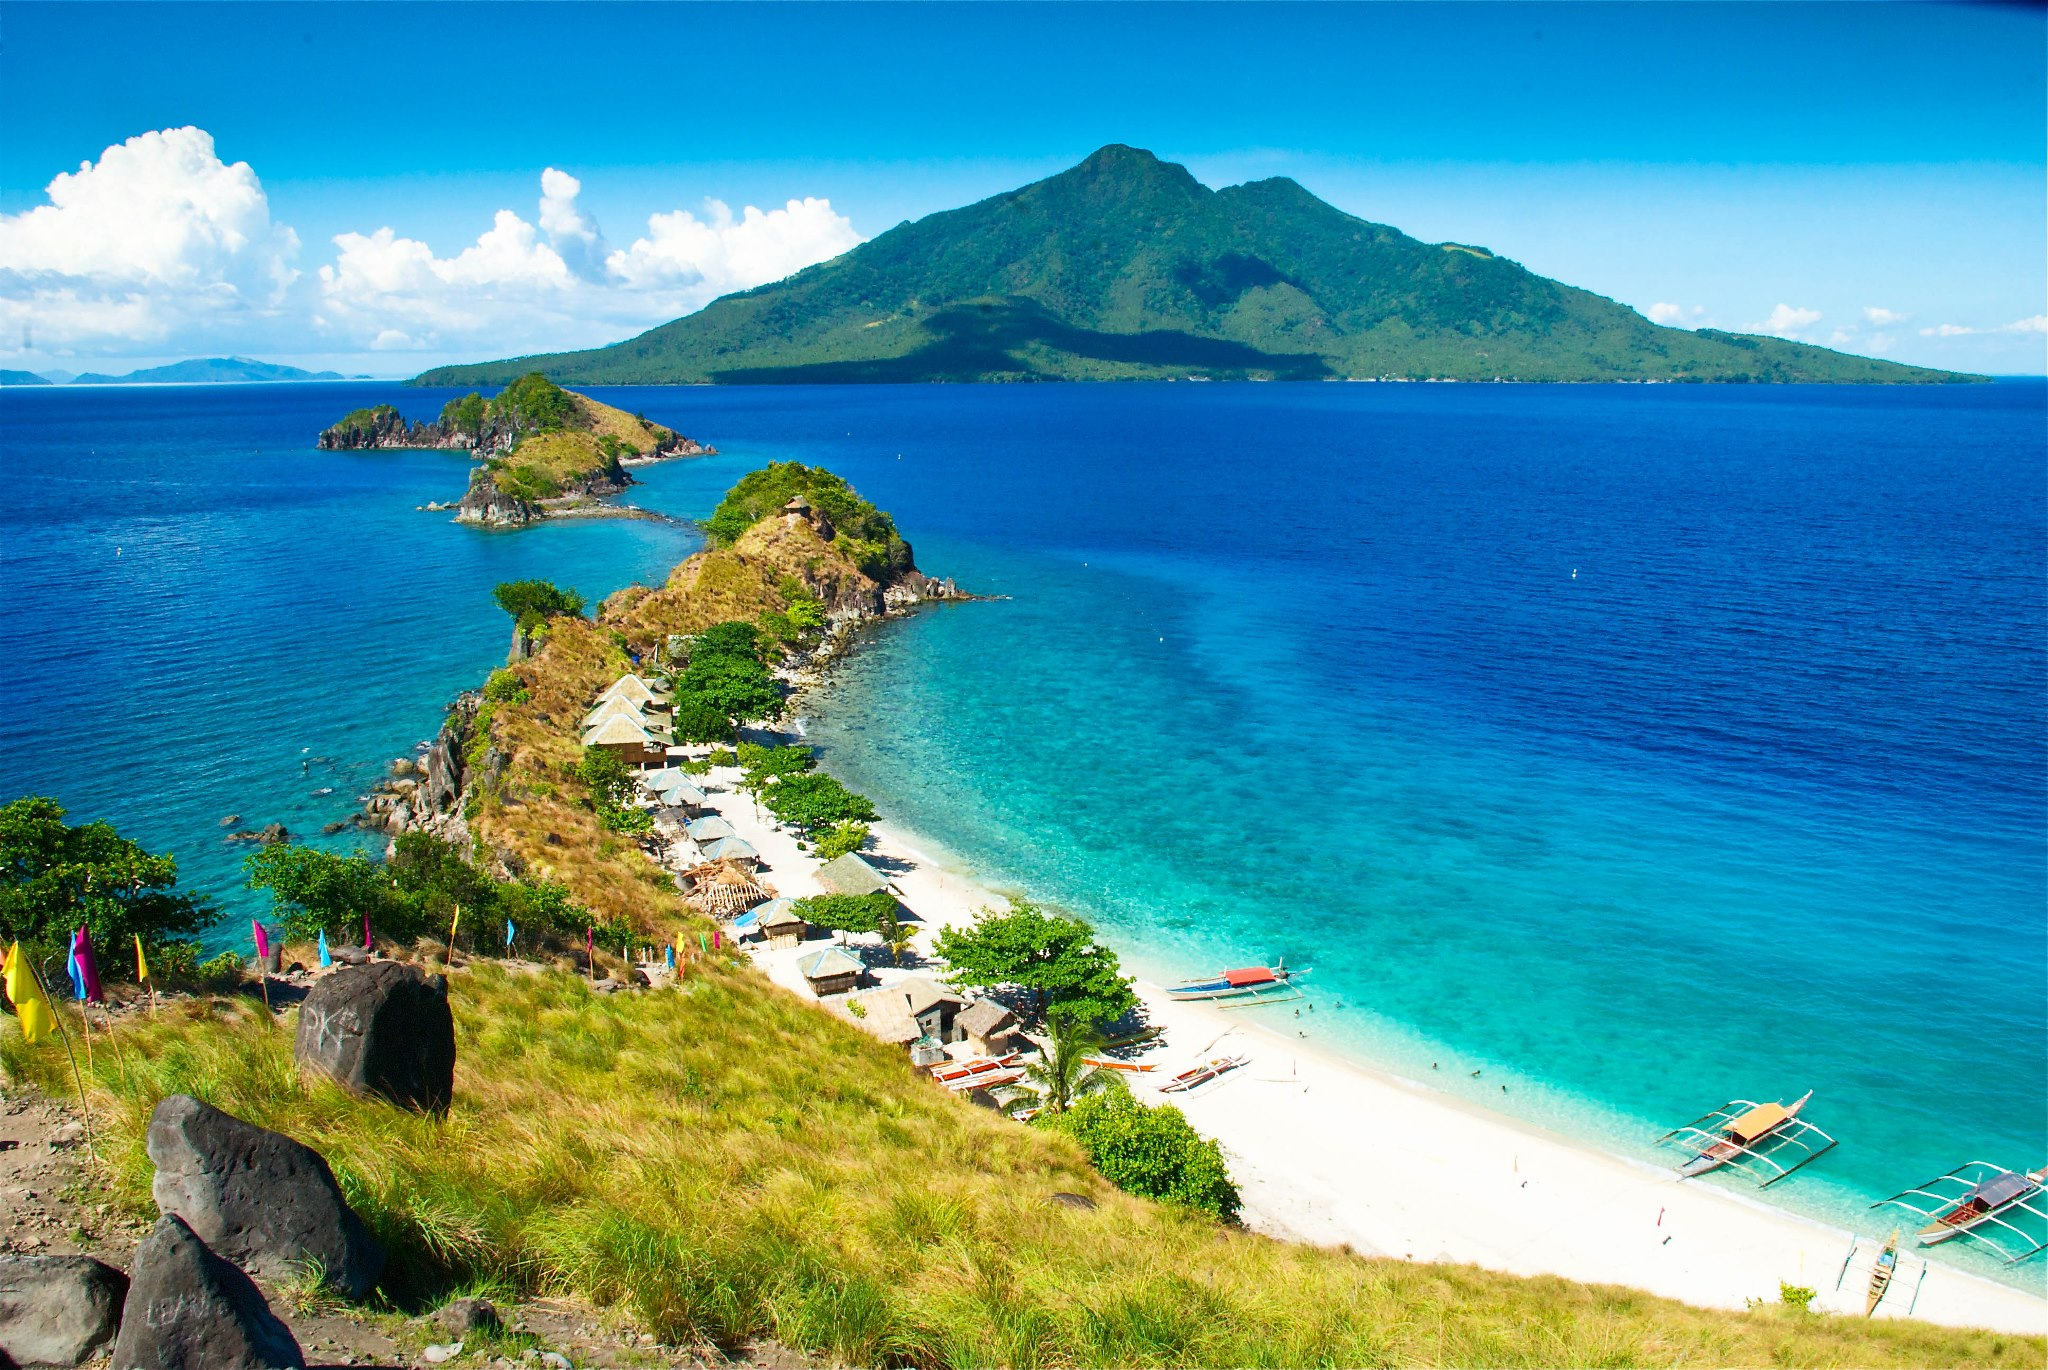 3-Day Itinerary – Sambawan/Higatangan Island - Biliran Tourism